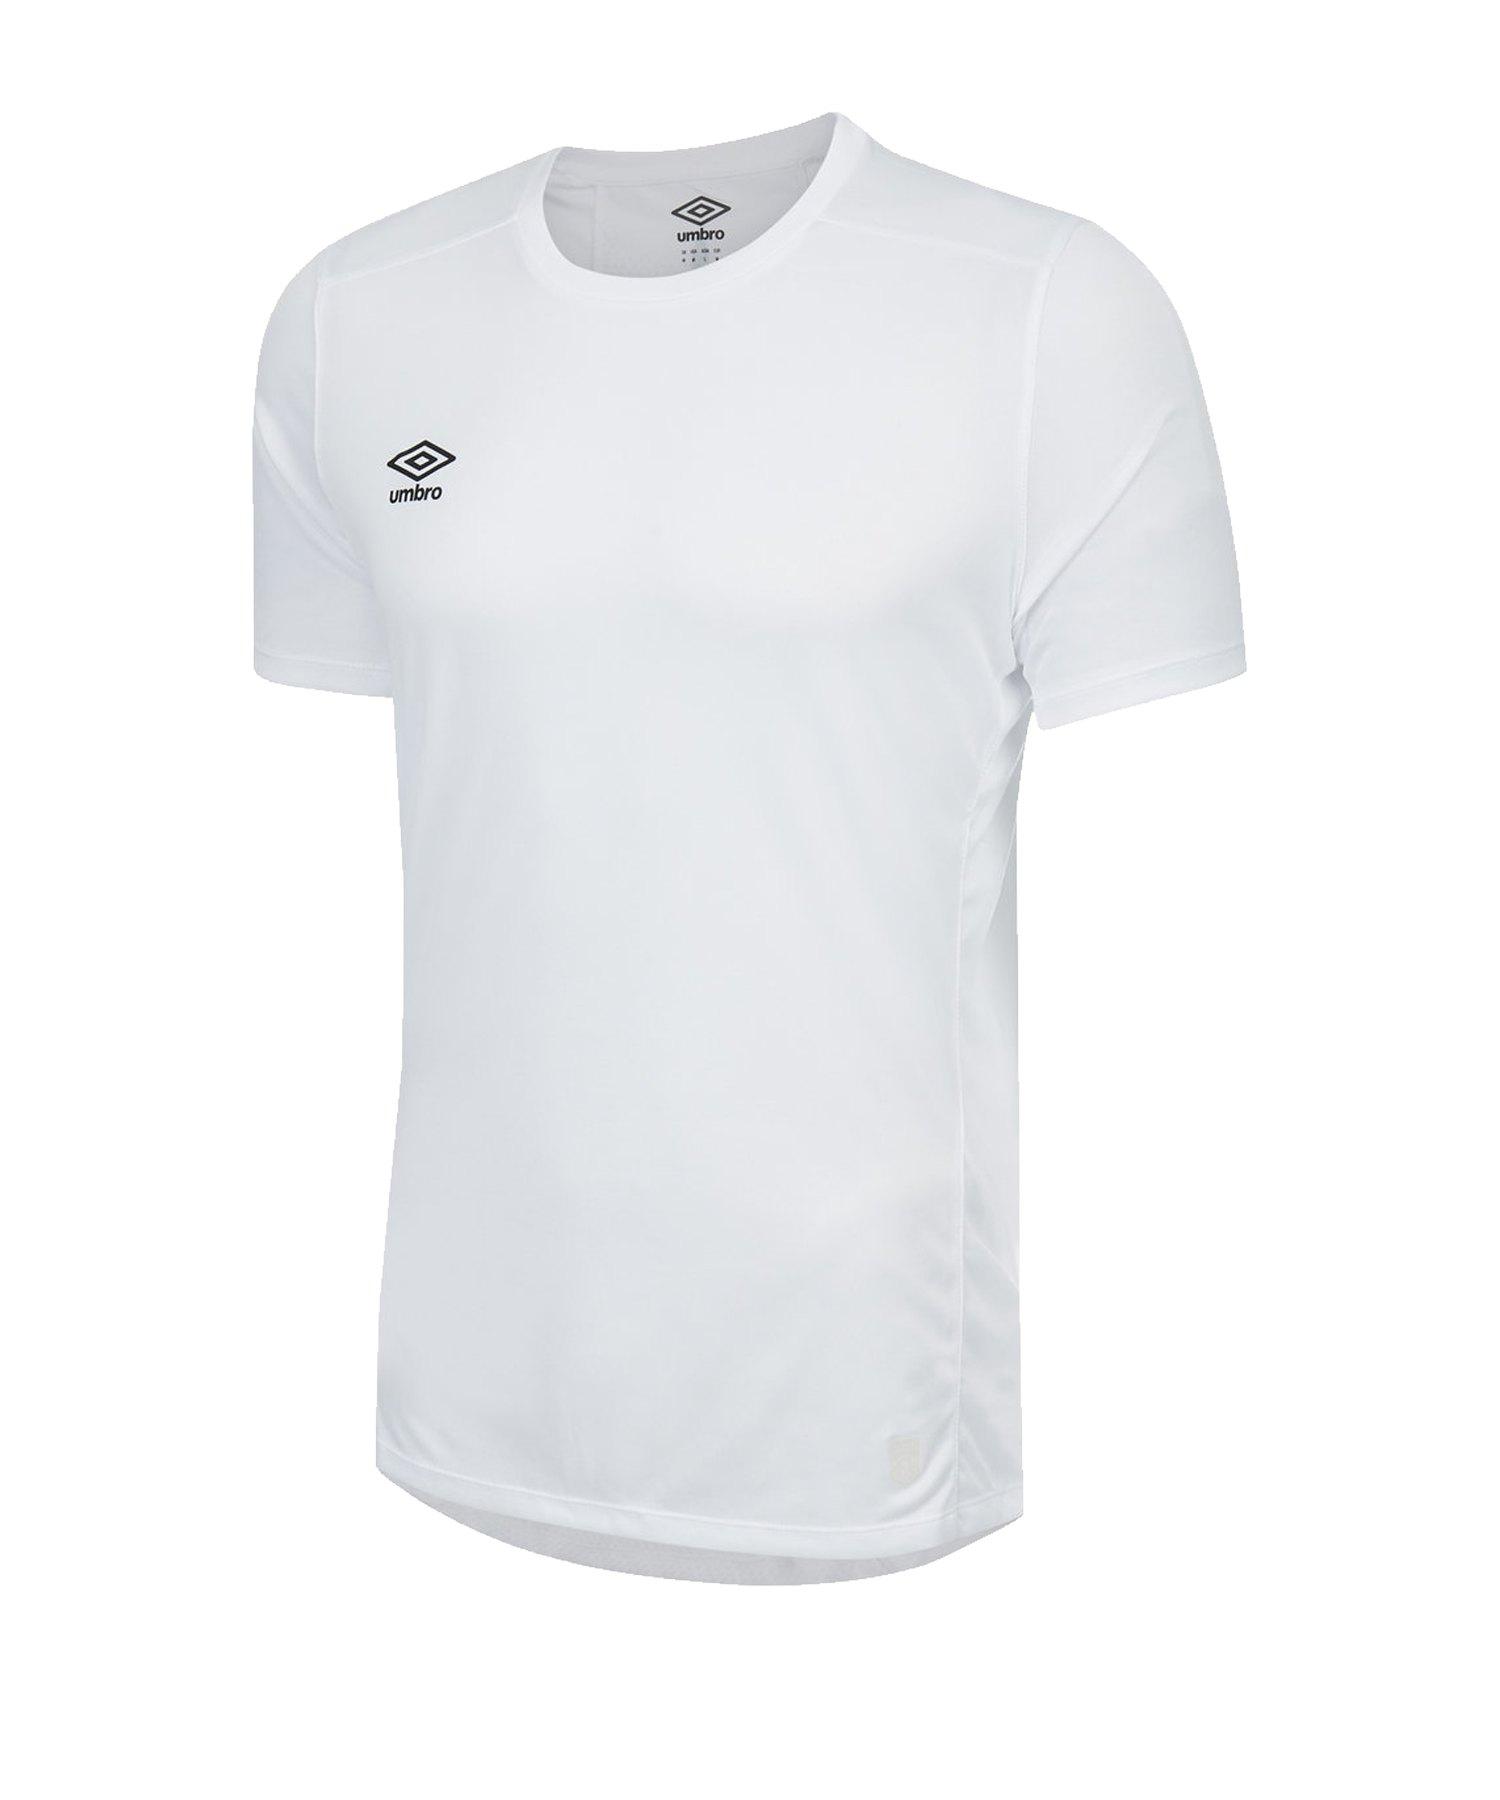 Umbro Silo Training T-Shirt Weiss F13V - weiss